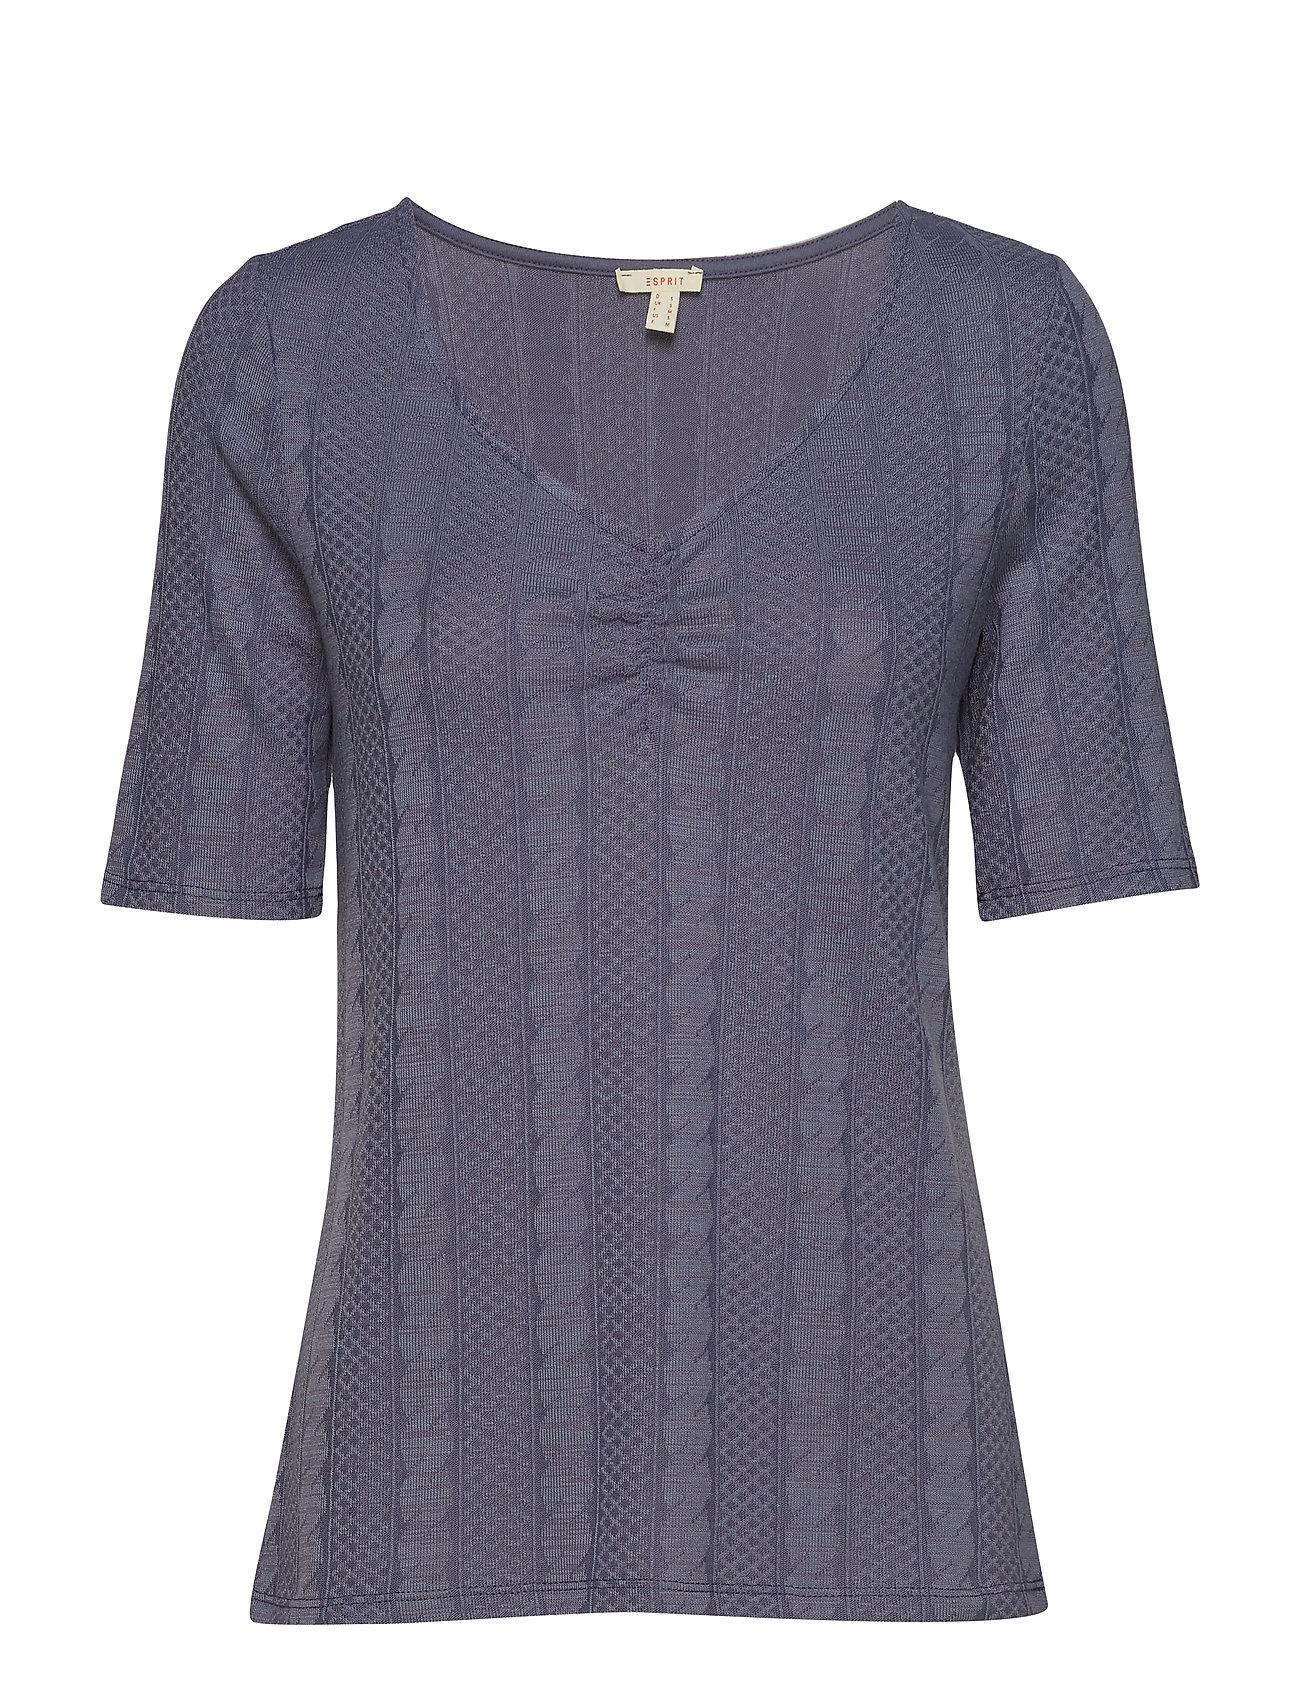 Esprit Casual T-Shirts - GREY BLUE 2